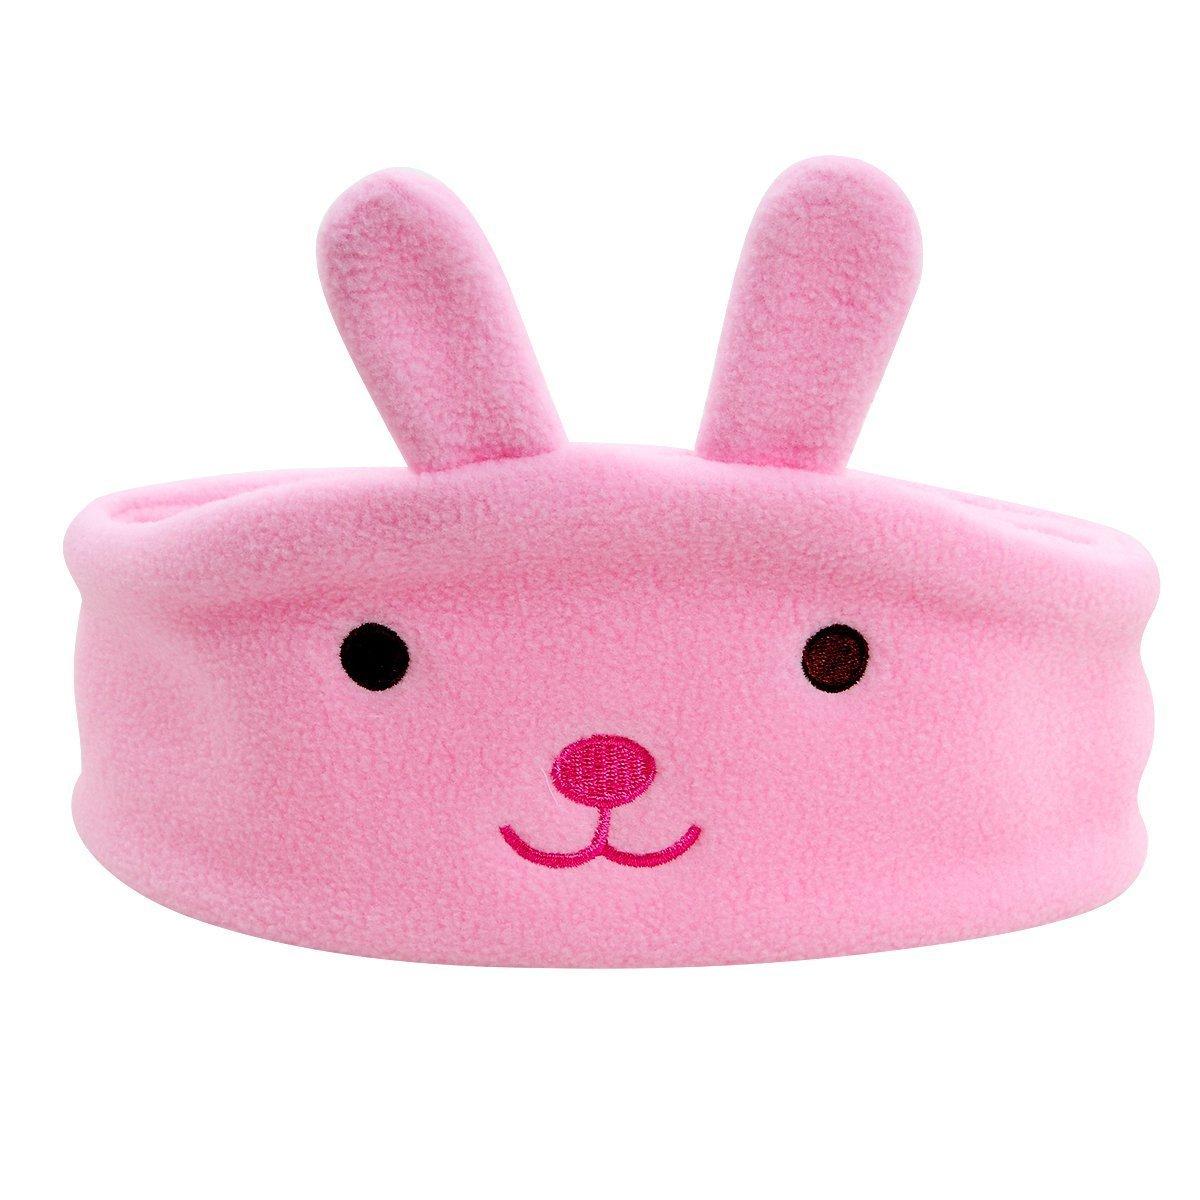 Children Headphone Kids Music Headphone Headband Volume Limited Adjustable Soft Children Fleece Washable Headband Eye Mask Sleeping Headphones for Travel and Home-Panda Xmas Birthday Gift (Pink)